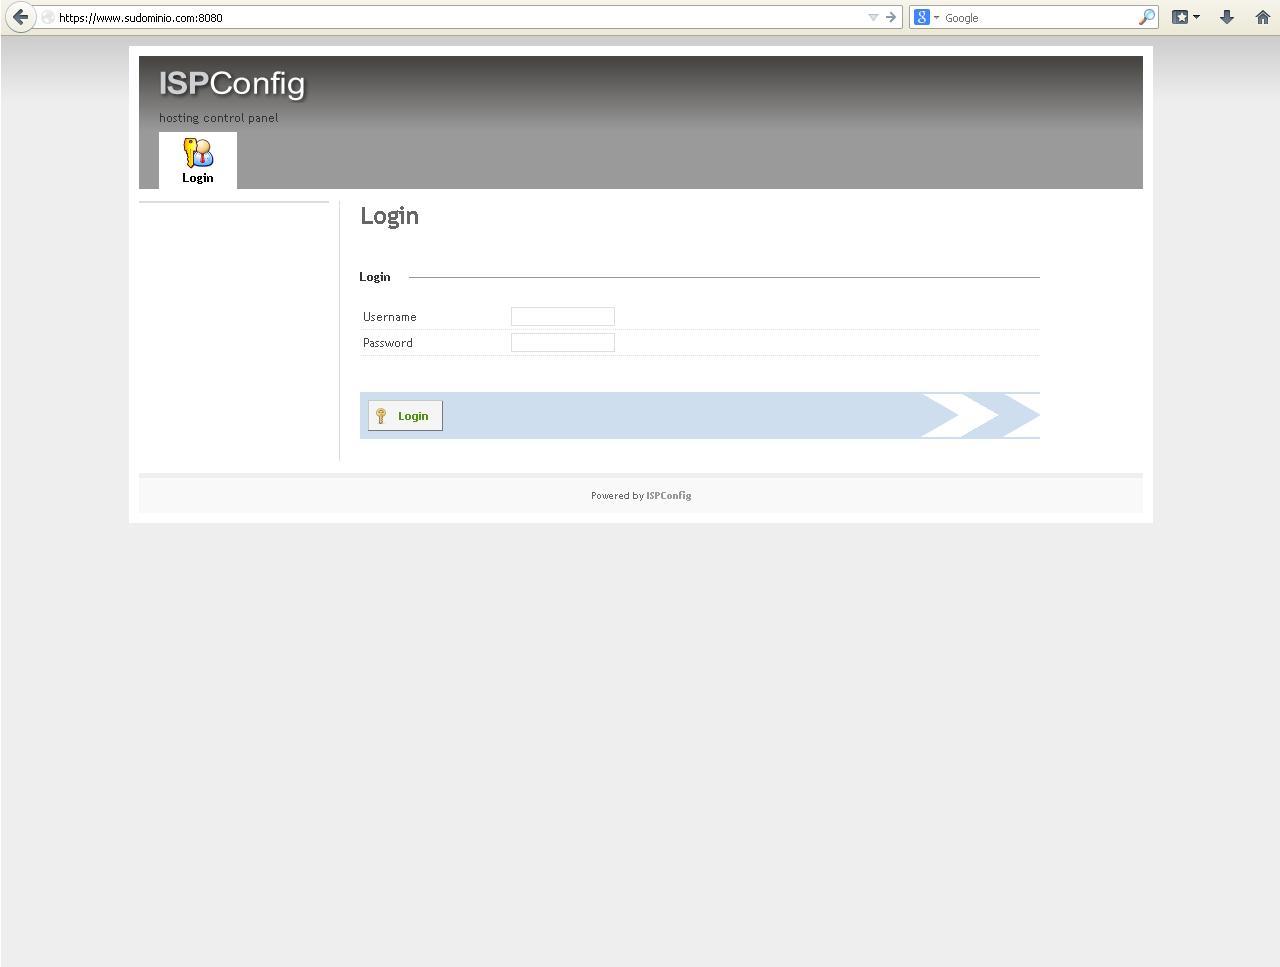 login-ISPConfig